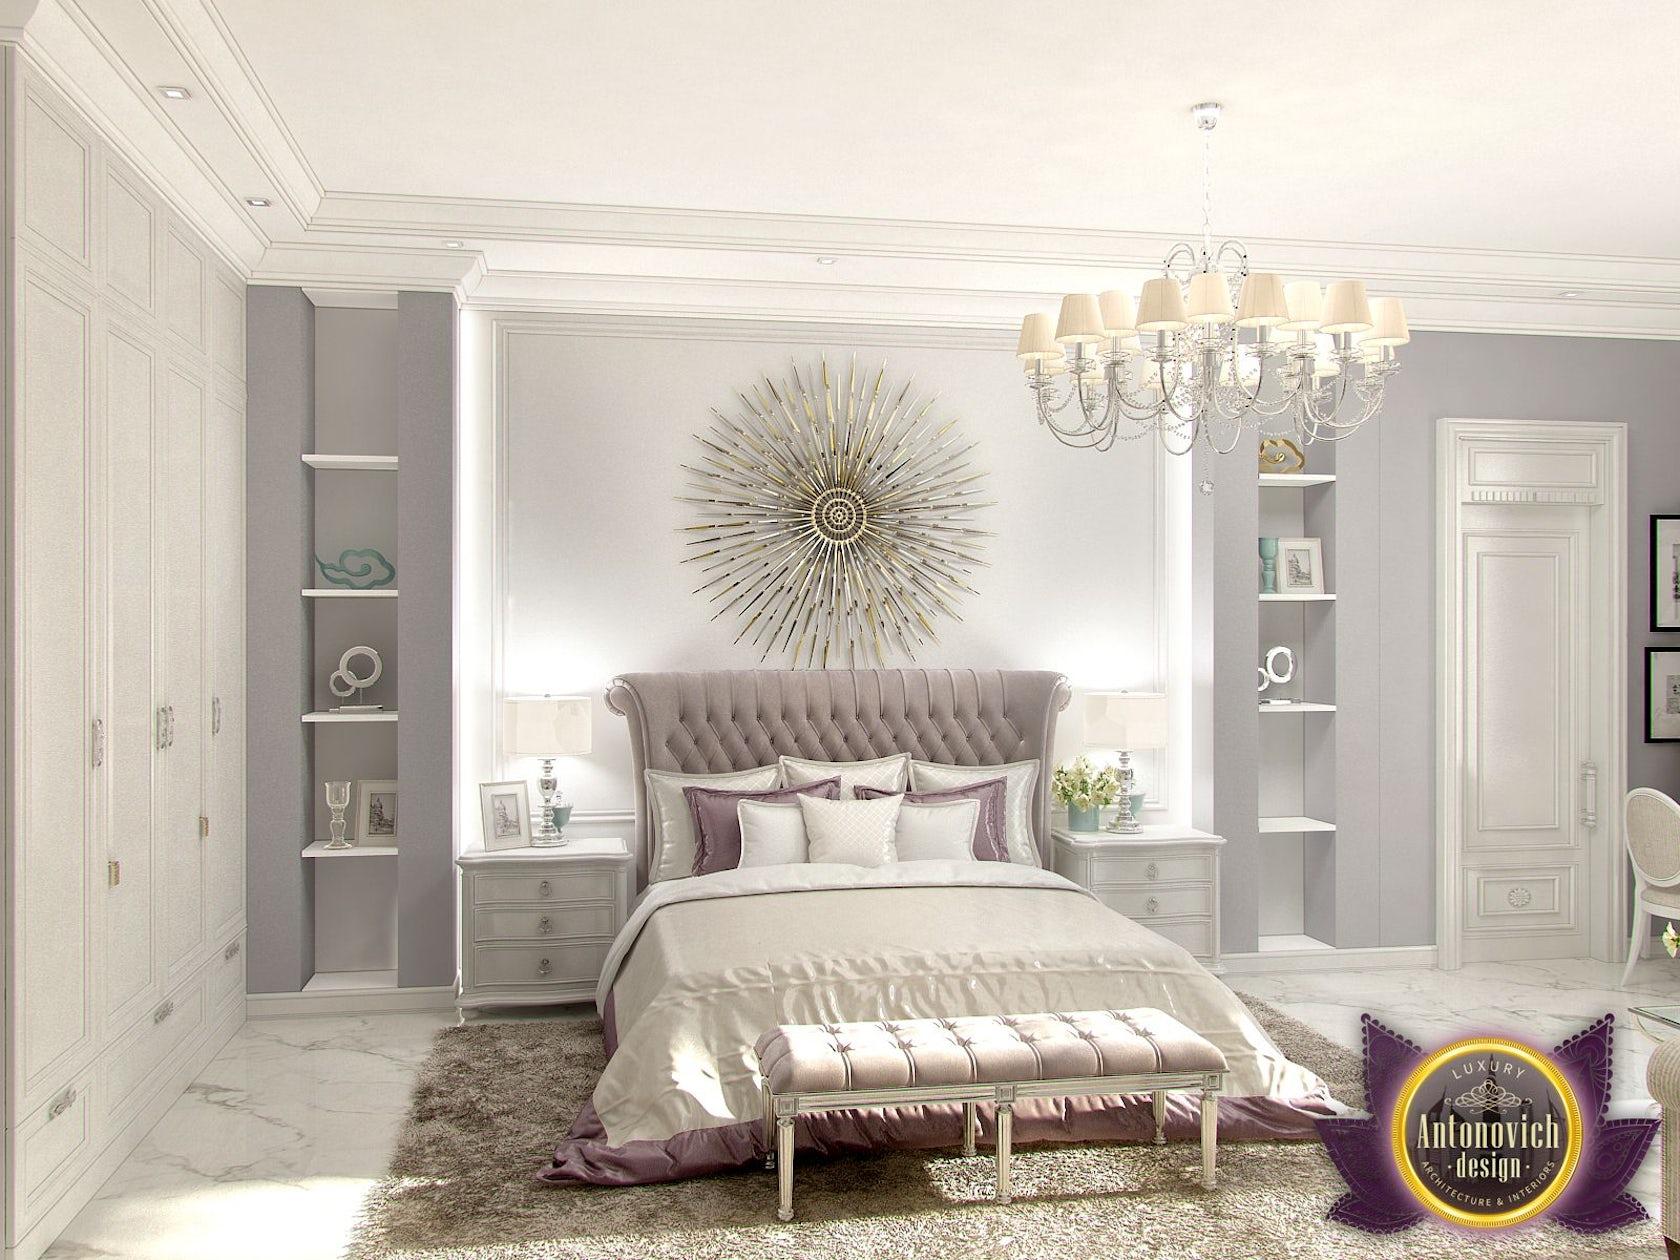 Kitchen Design Usa By Katrina Antonovich: Modern Bedroom Designs By Katrina Antonovich